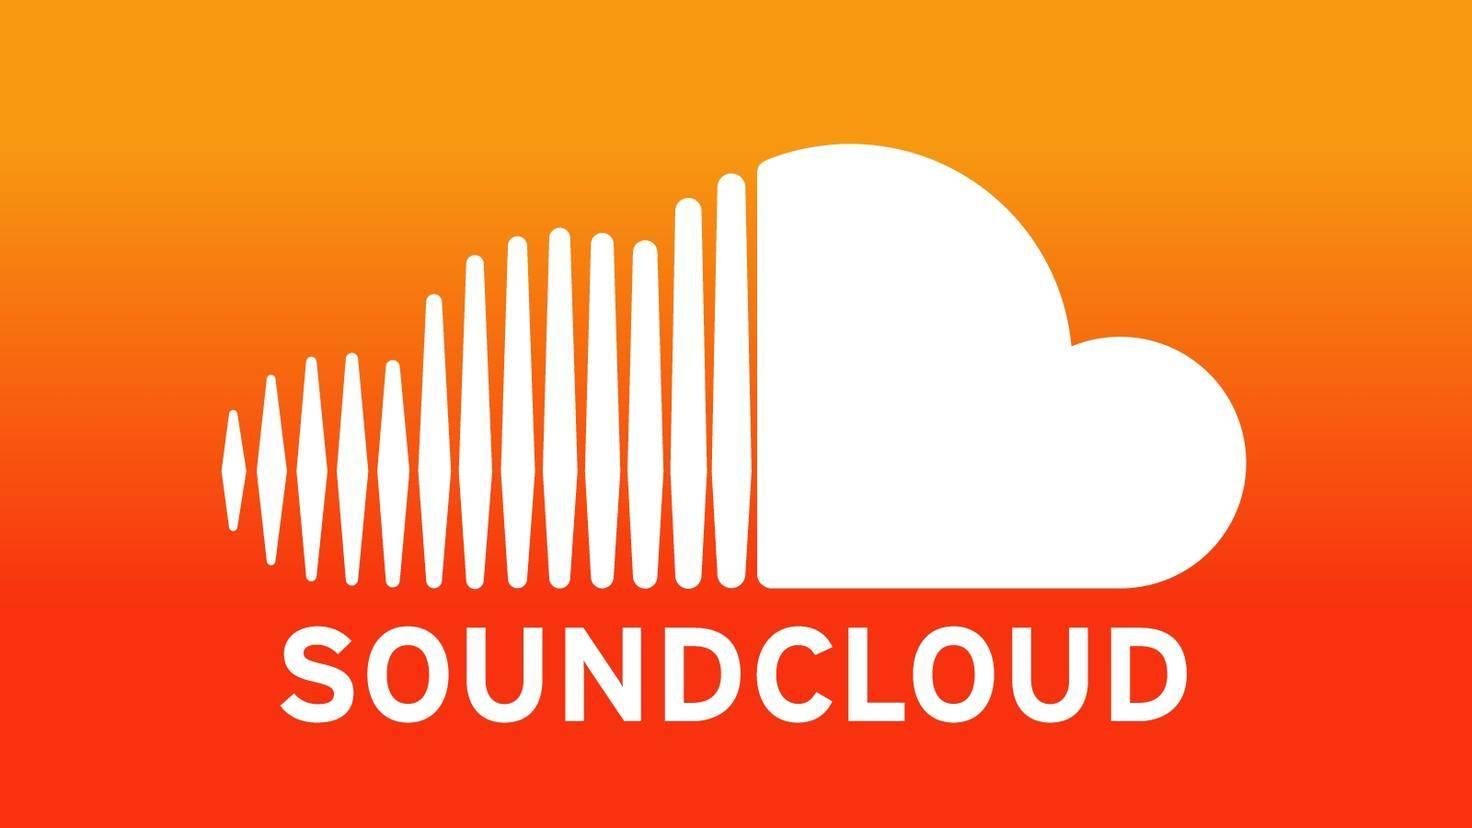 Sloundcloud logo